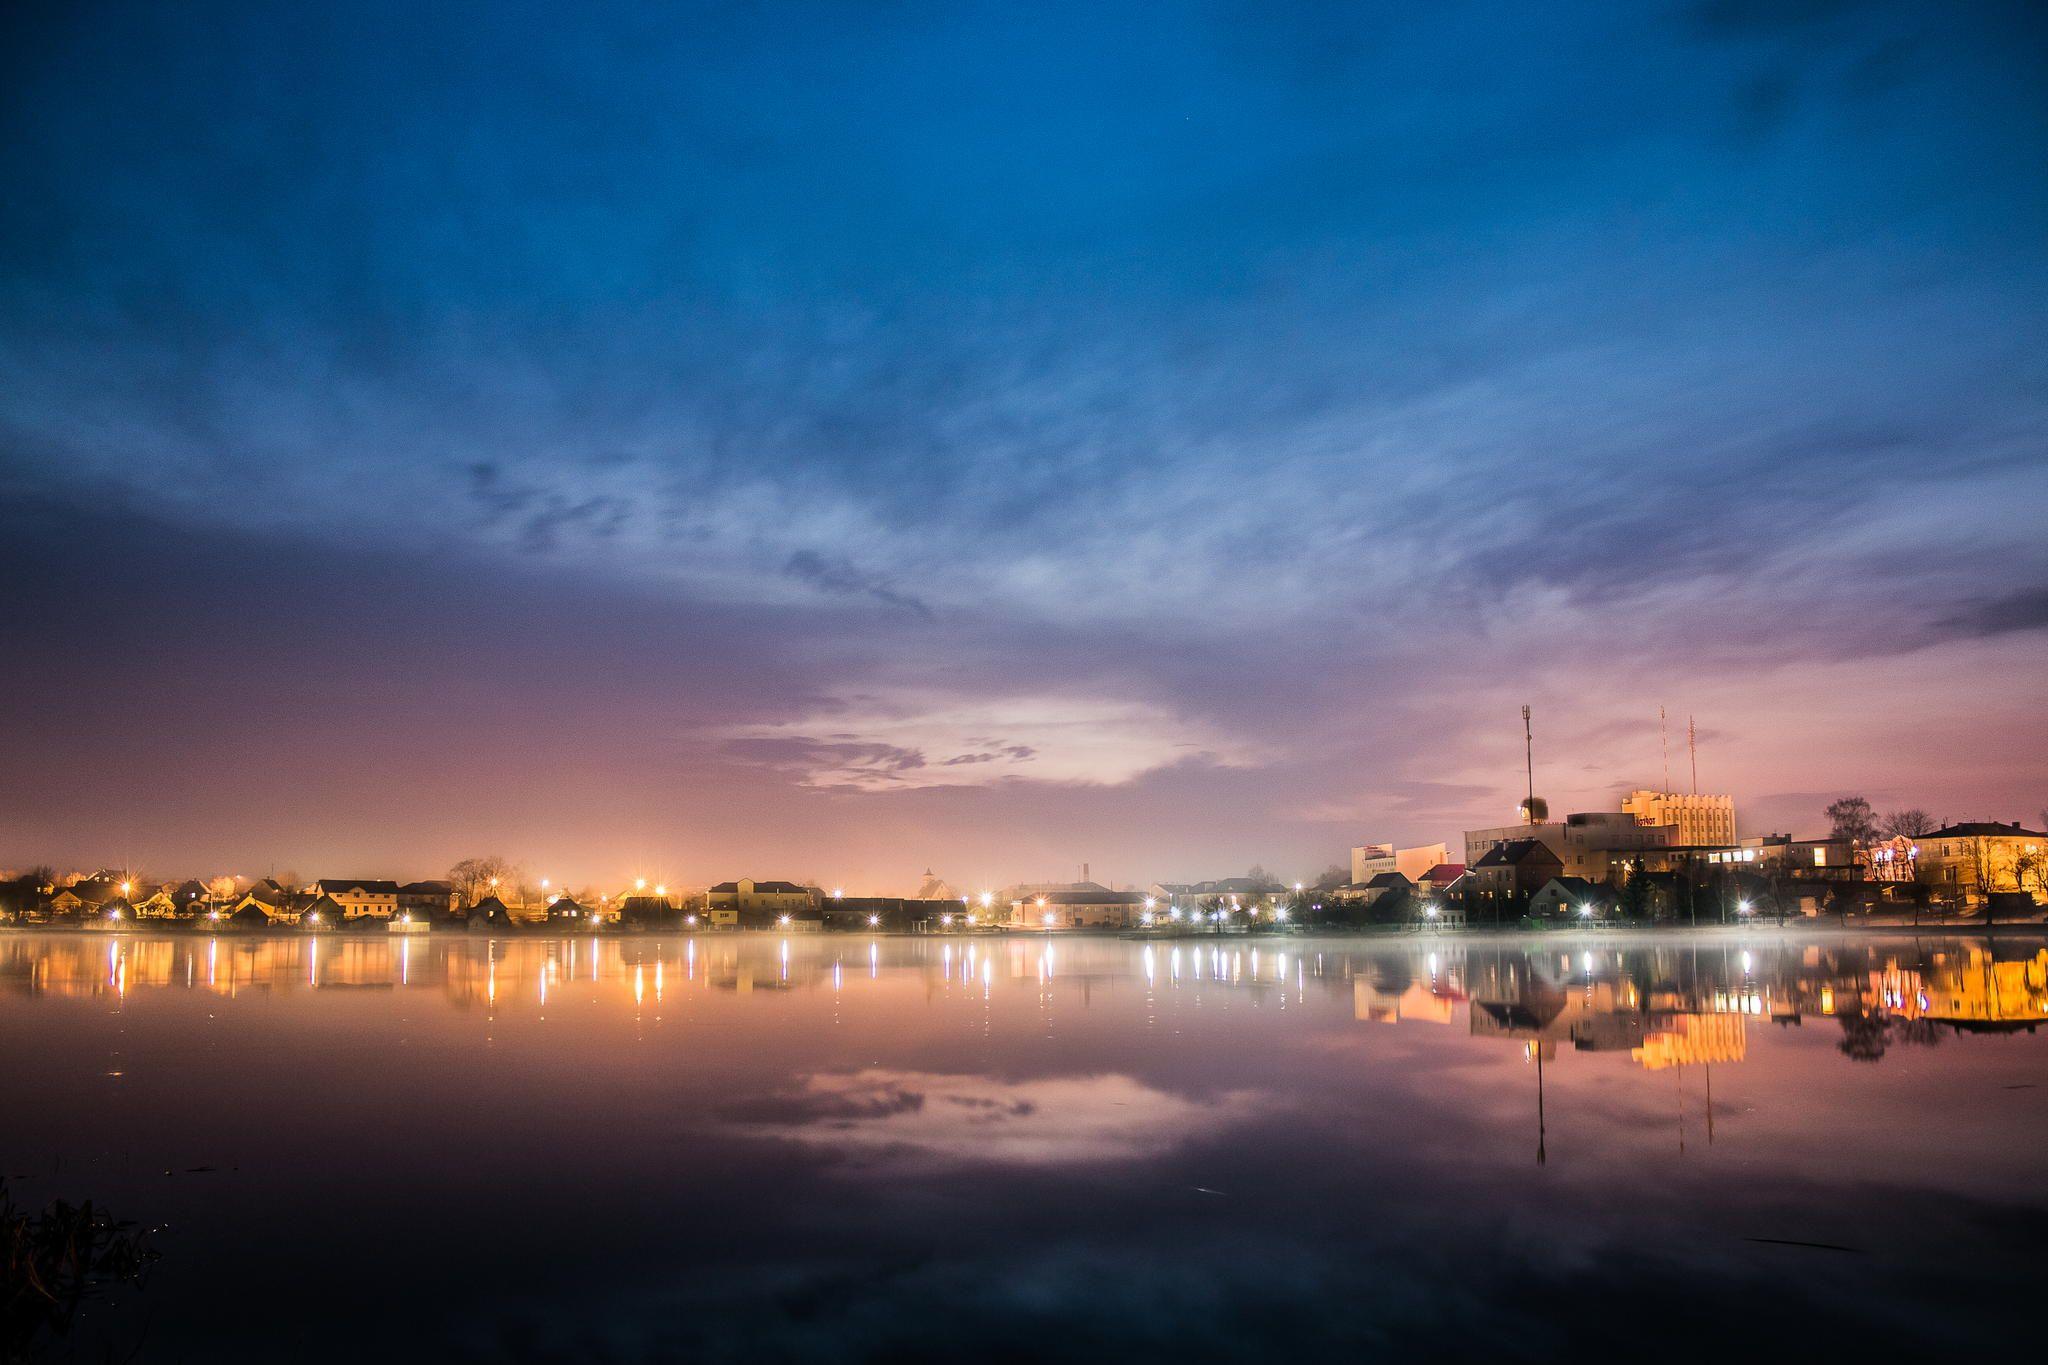 Фотография Вечерний город автор Pavel Shauro на 500px